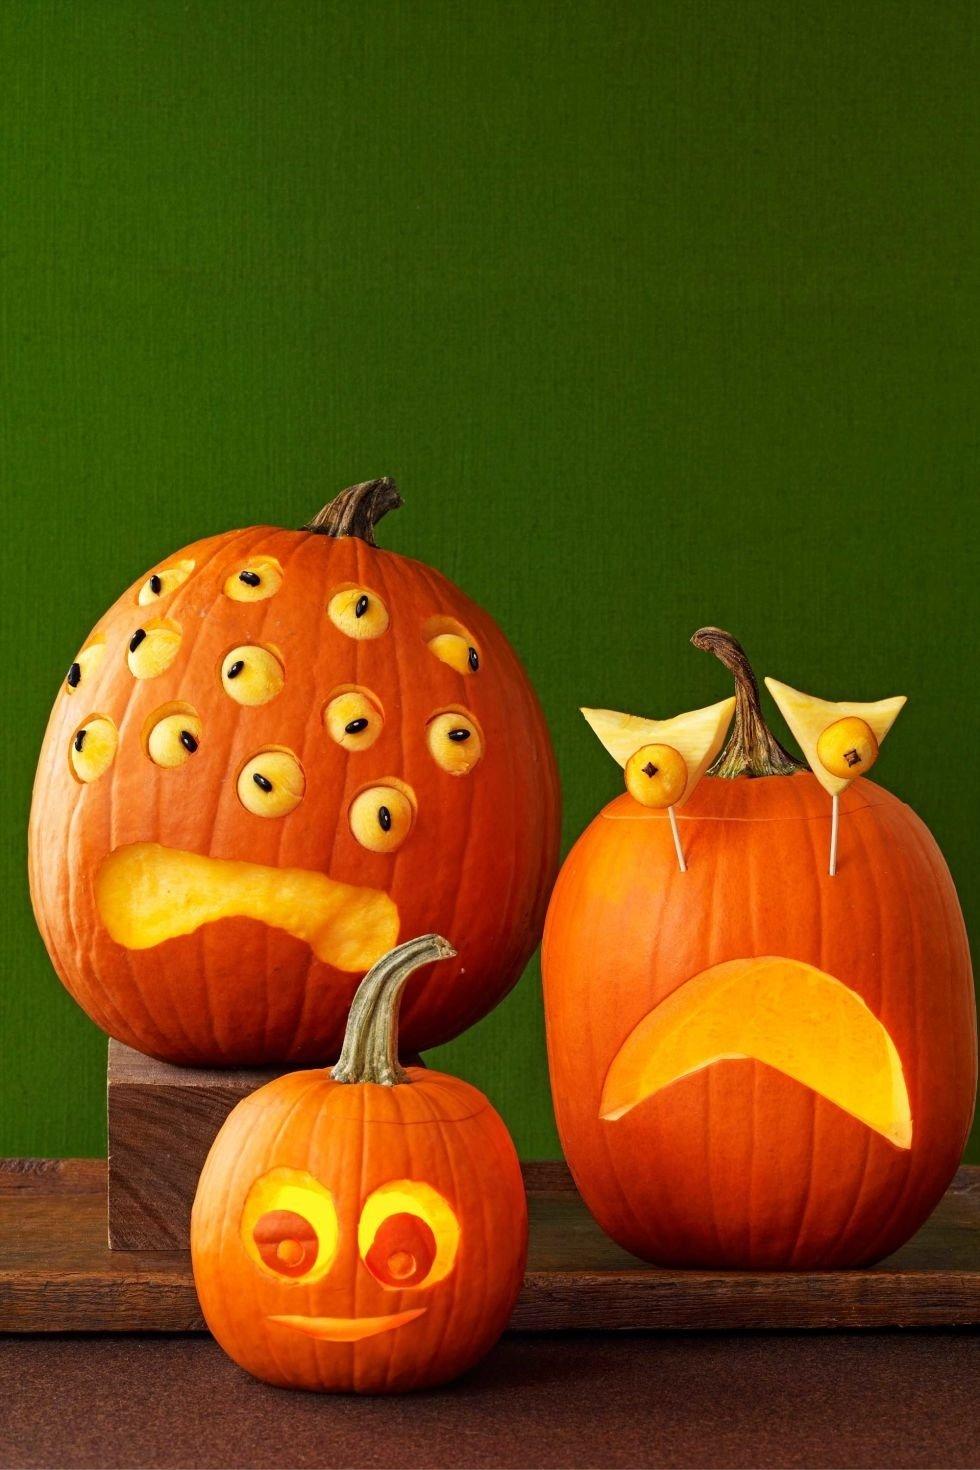 10 Amazing Jack O Lantern Carving Ideas pumpkin carving ideas 2017 free download 2 halloween pumpkin 2020